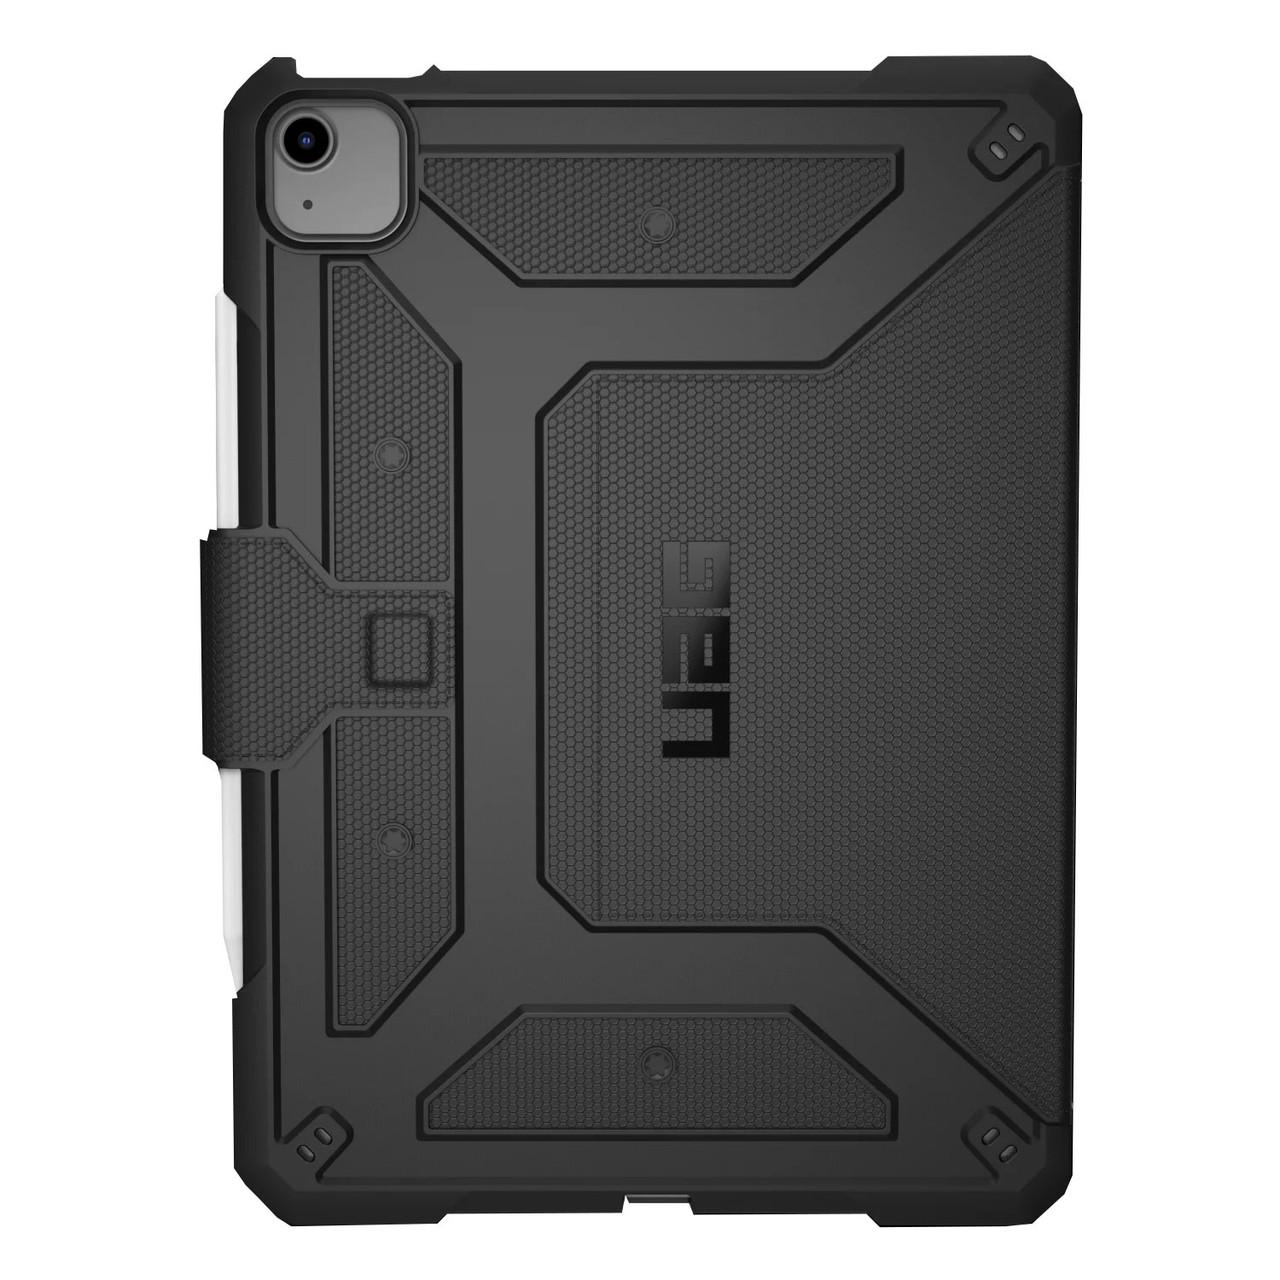 Uag Metropolis Case For Ipad Air 4th Gen 2020 Pro 11 Black